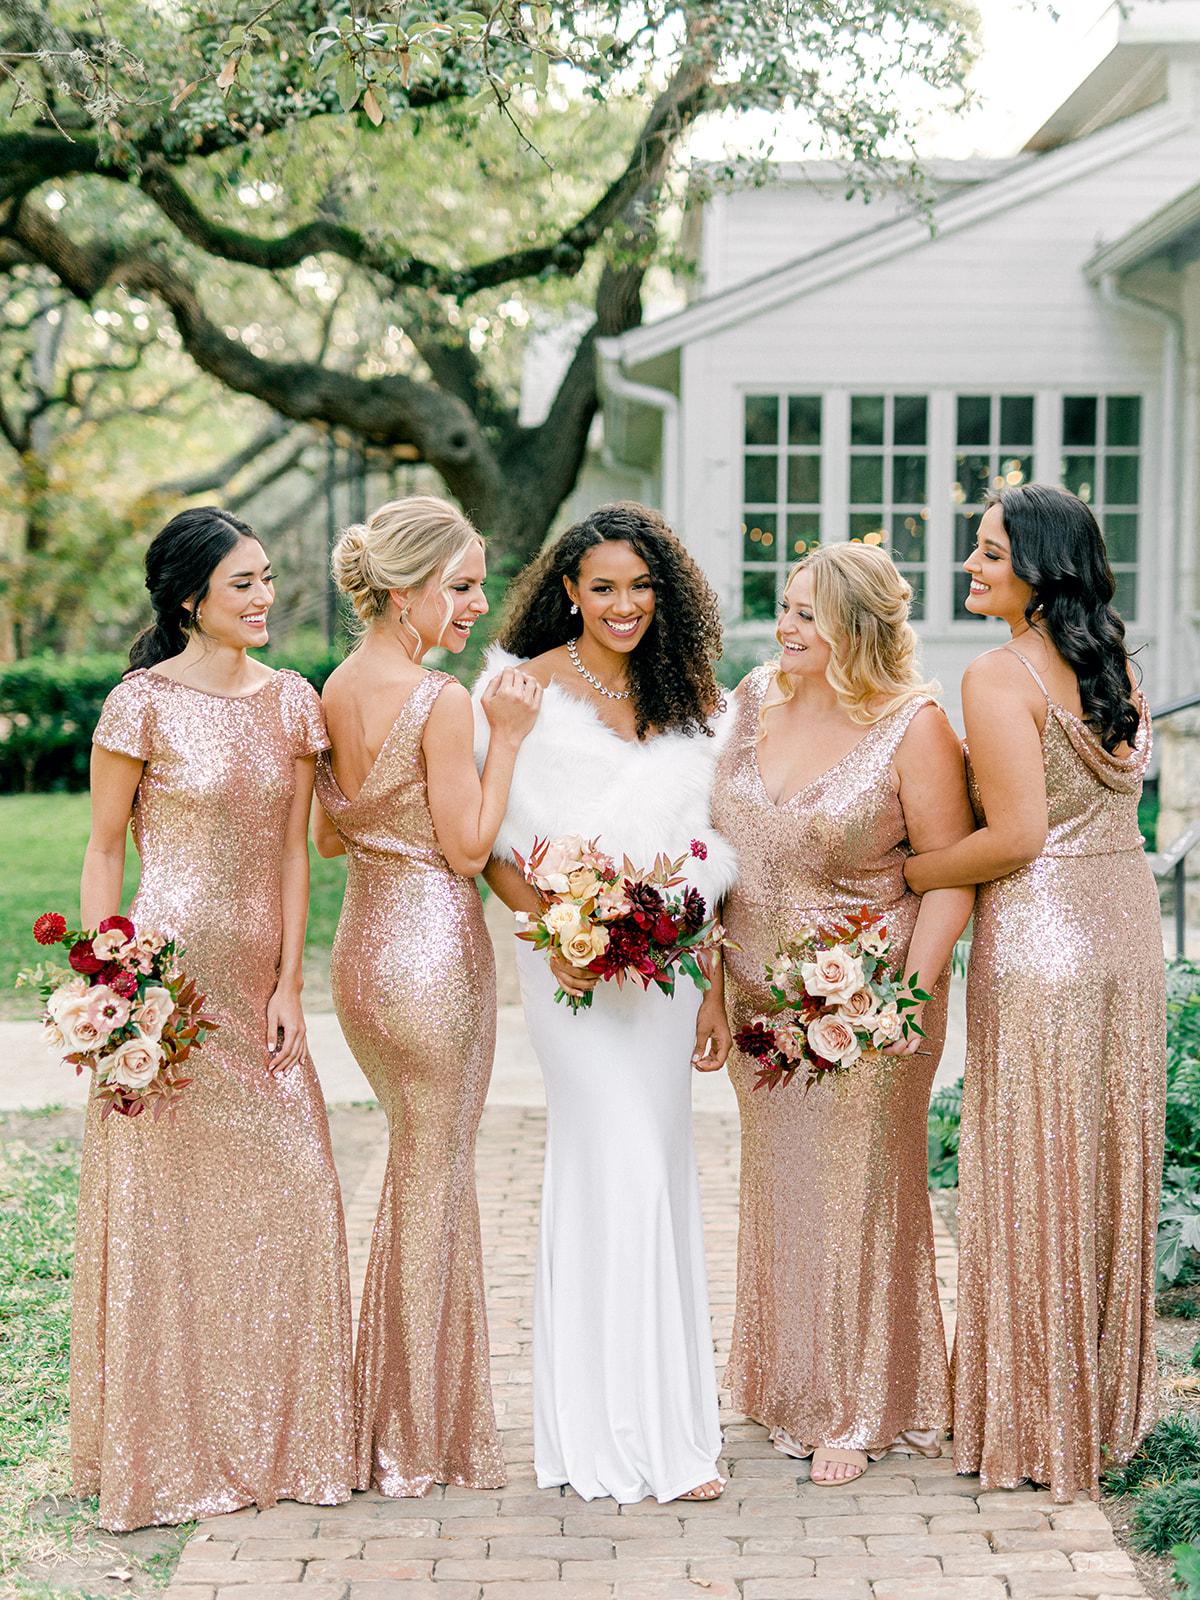 Sequin Bridesmaid Dresses   Sequin Dress Collection